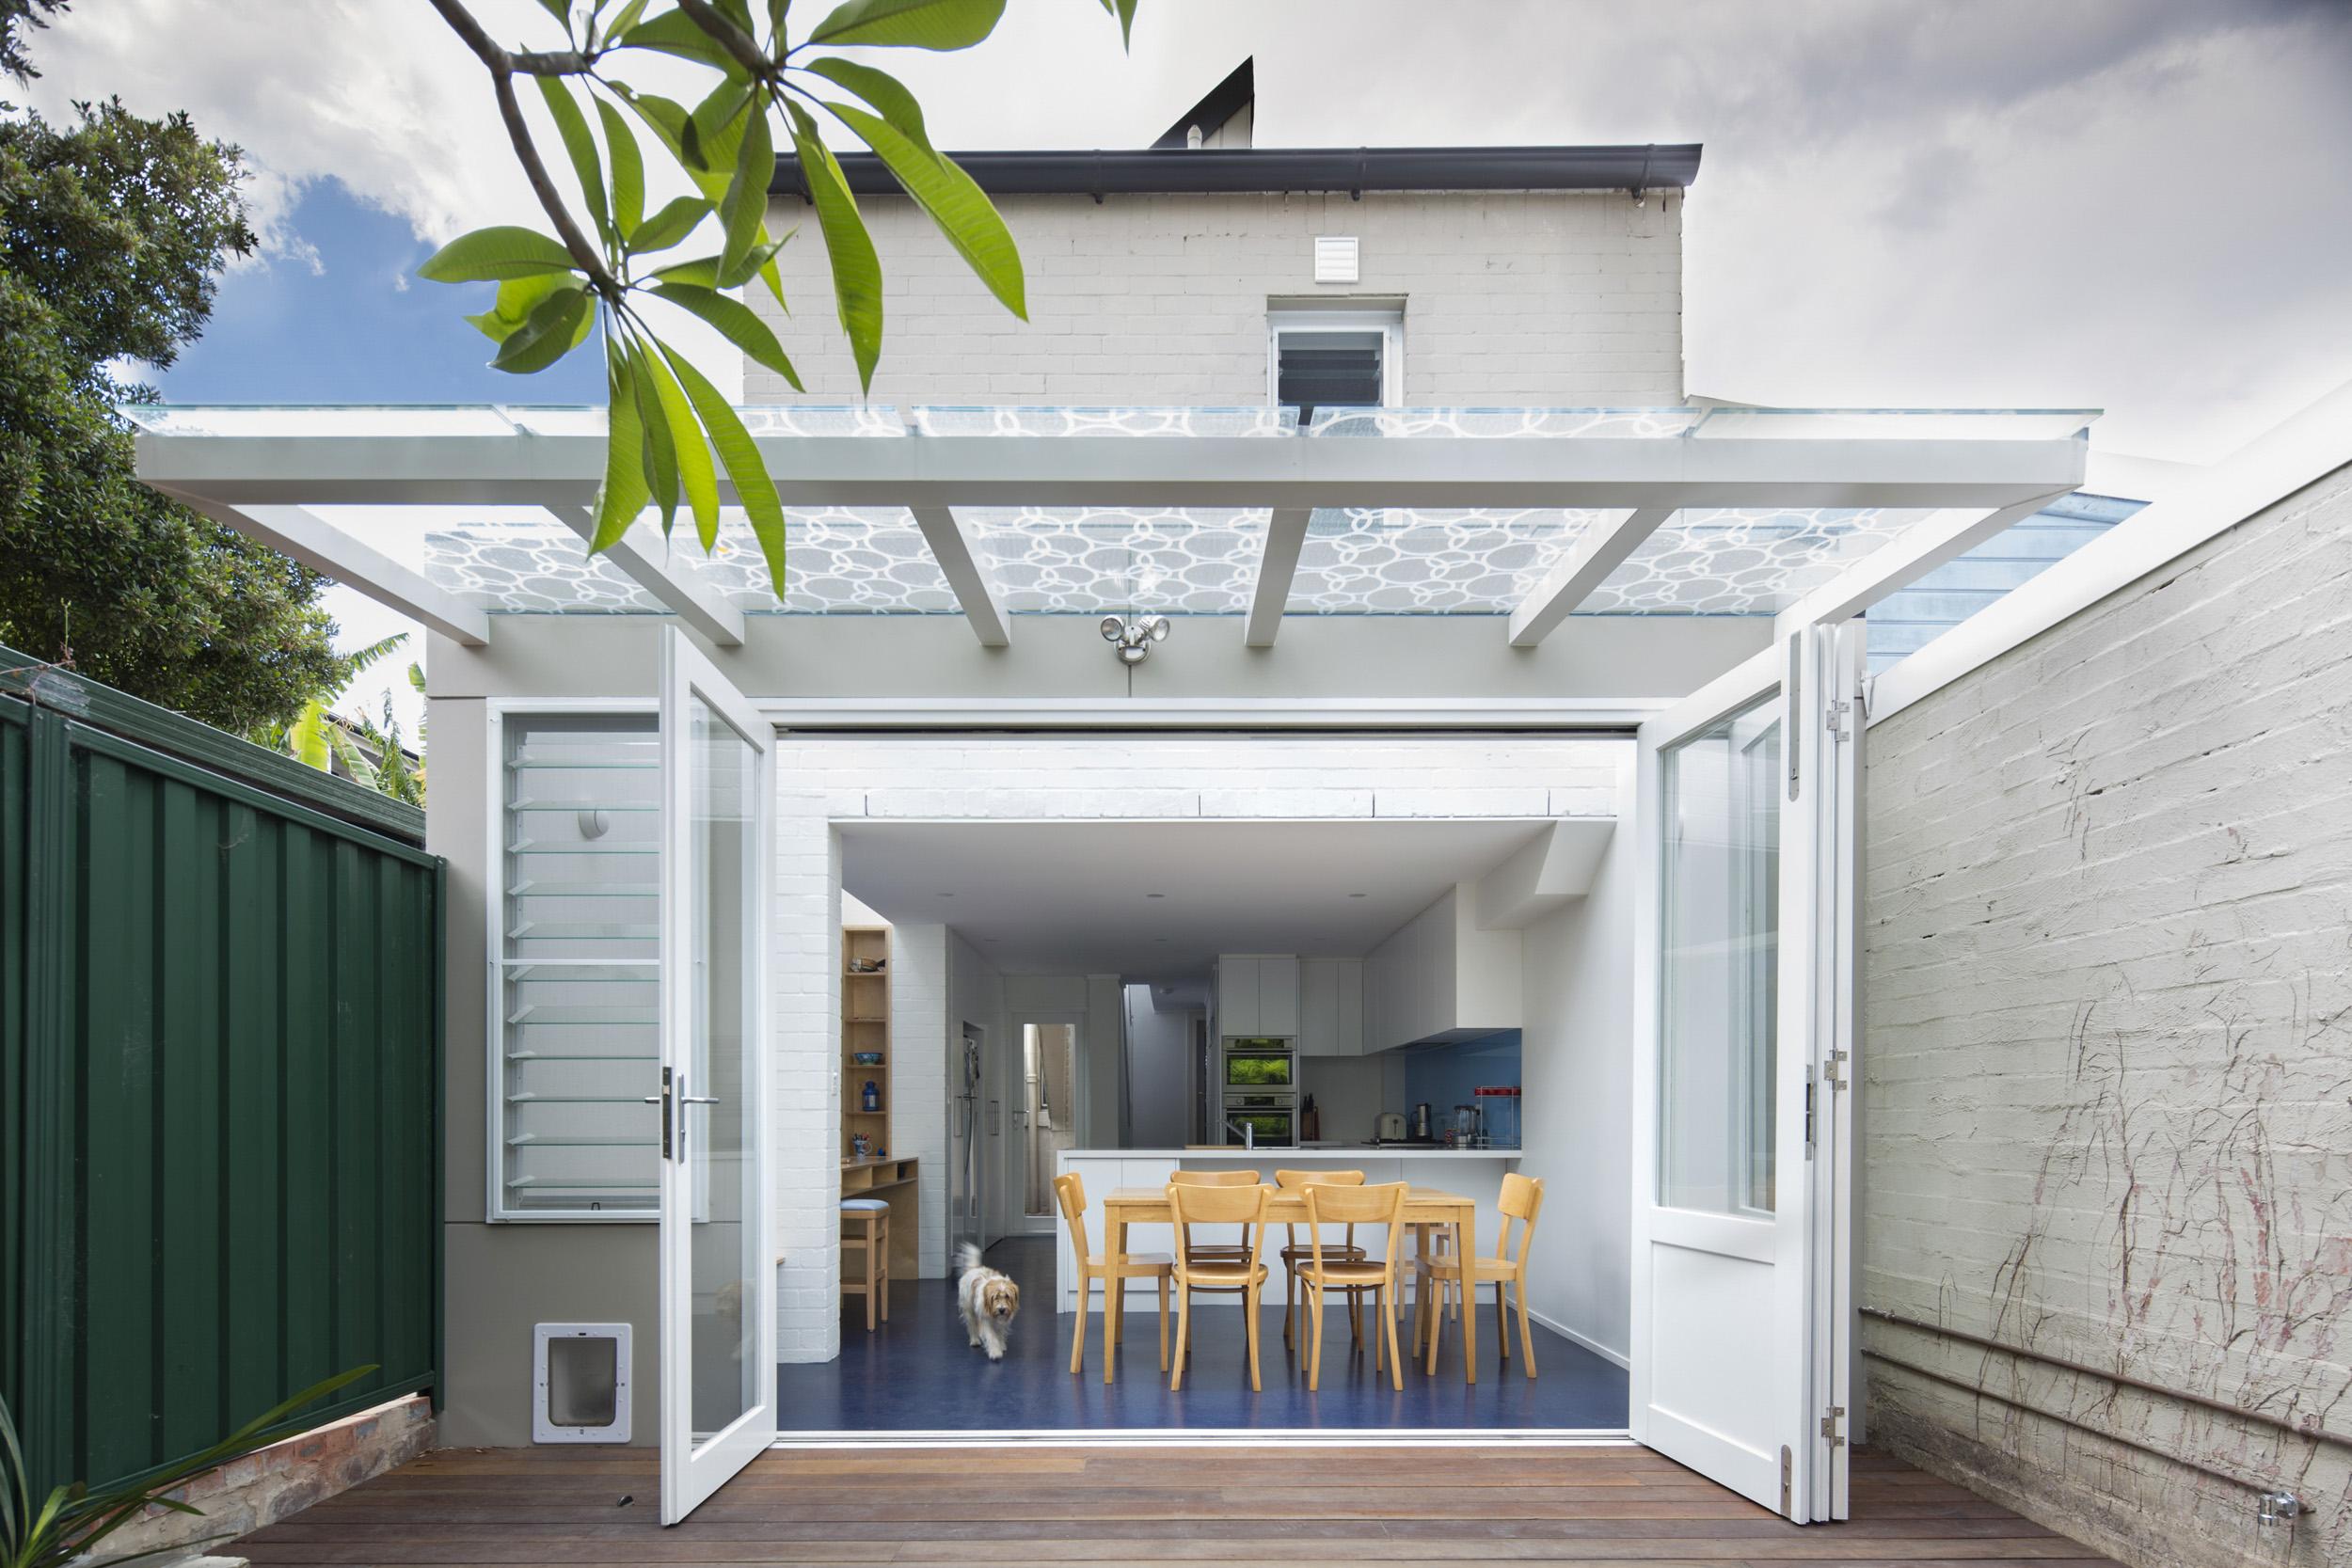 residential_architecture_sydney_australia_02.jpg